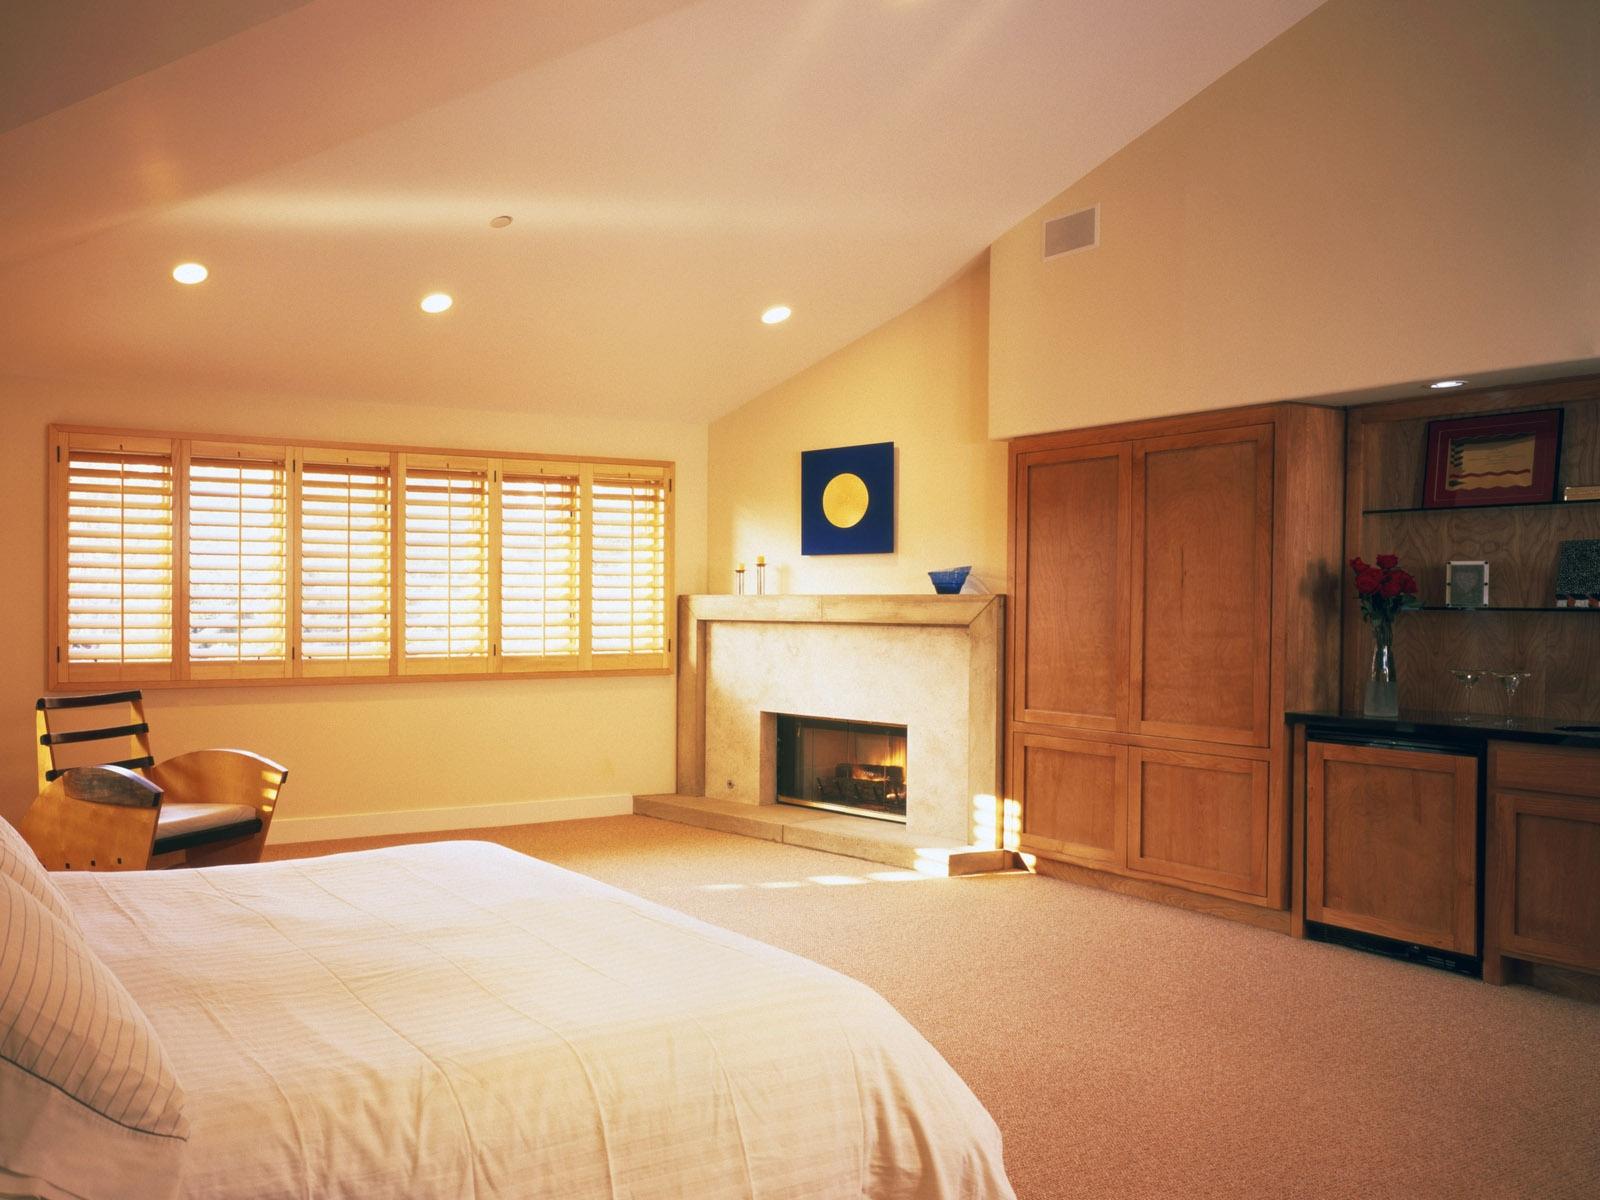 wallpaper bed house fireplace bedroom interior design cottage rh wallhere com